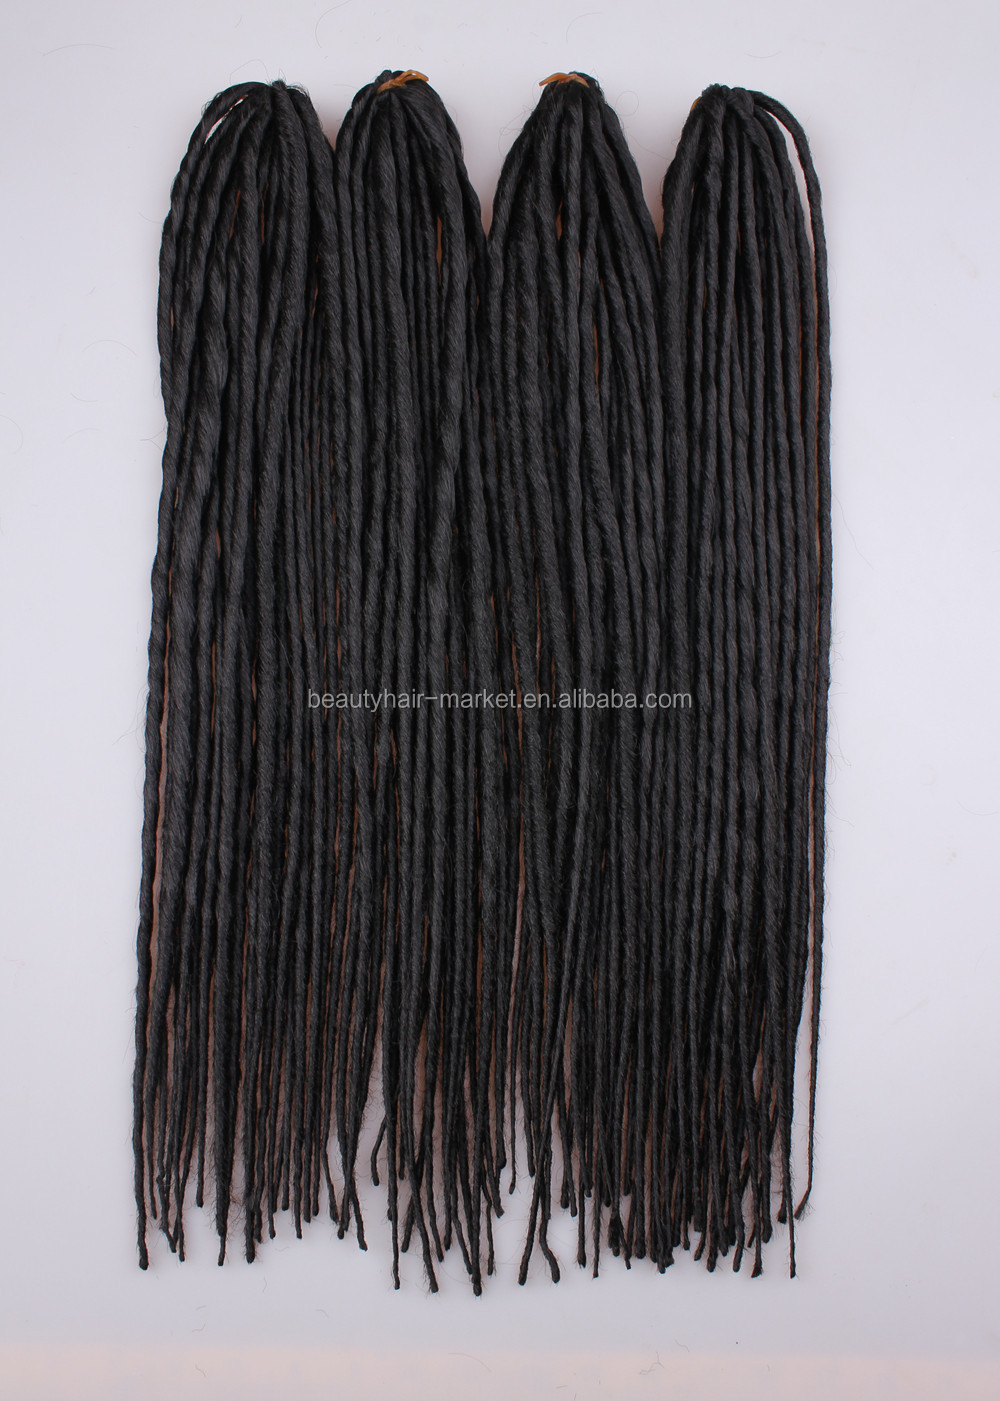 Synthetic hair dreadlocks hair extension dreadlocks on sale hair synthetic hair dreadlocks hair extension dreadlocks on sale hair dreads braiding pmusecretfo Choice Image